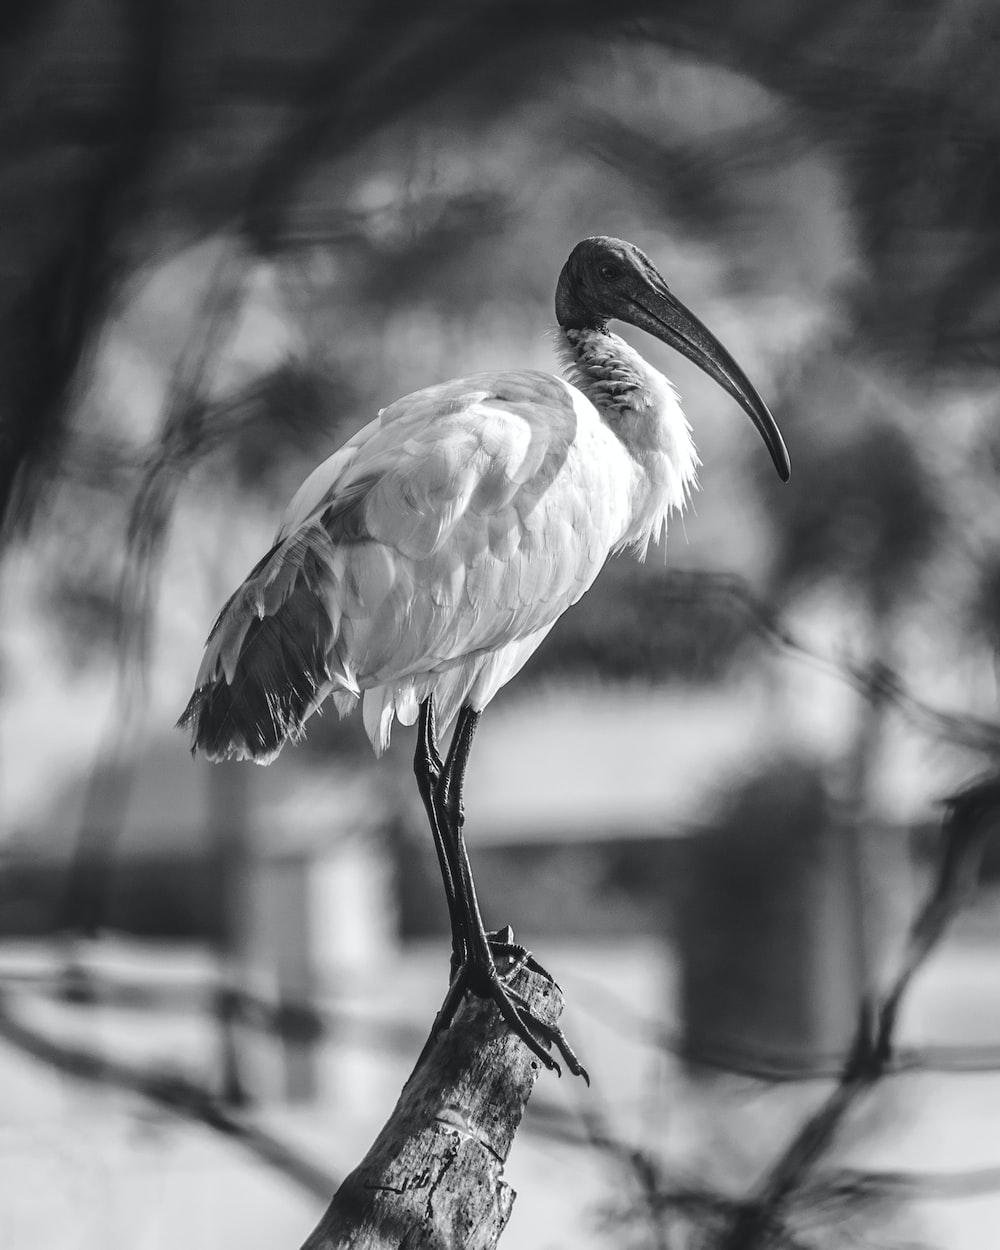 grayscale photo of a bird